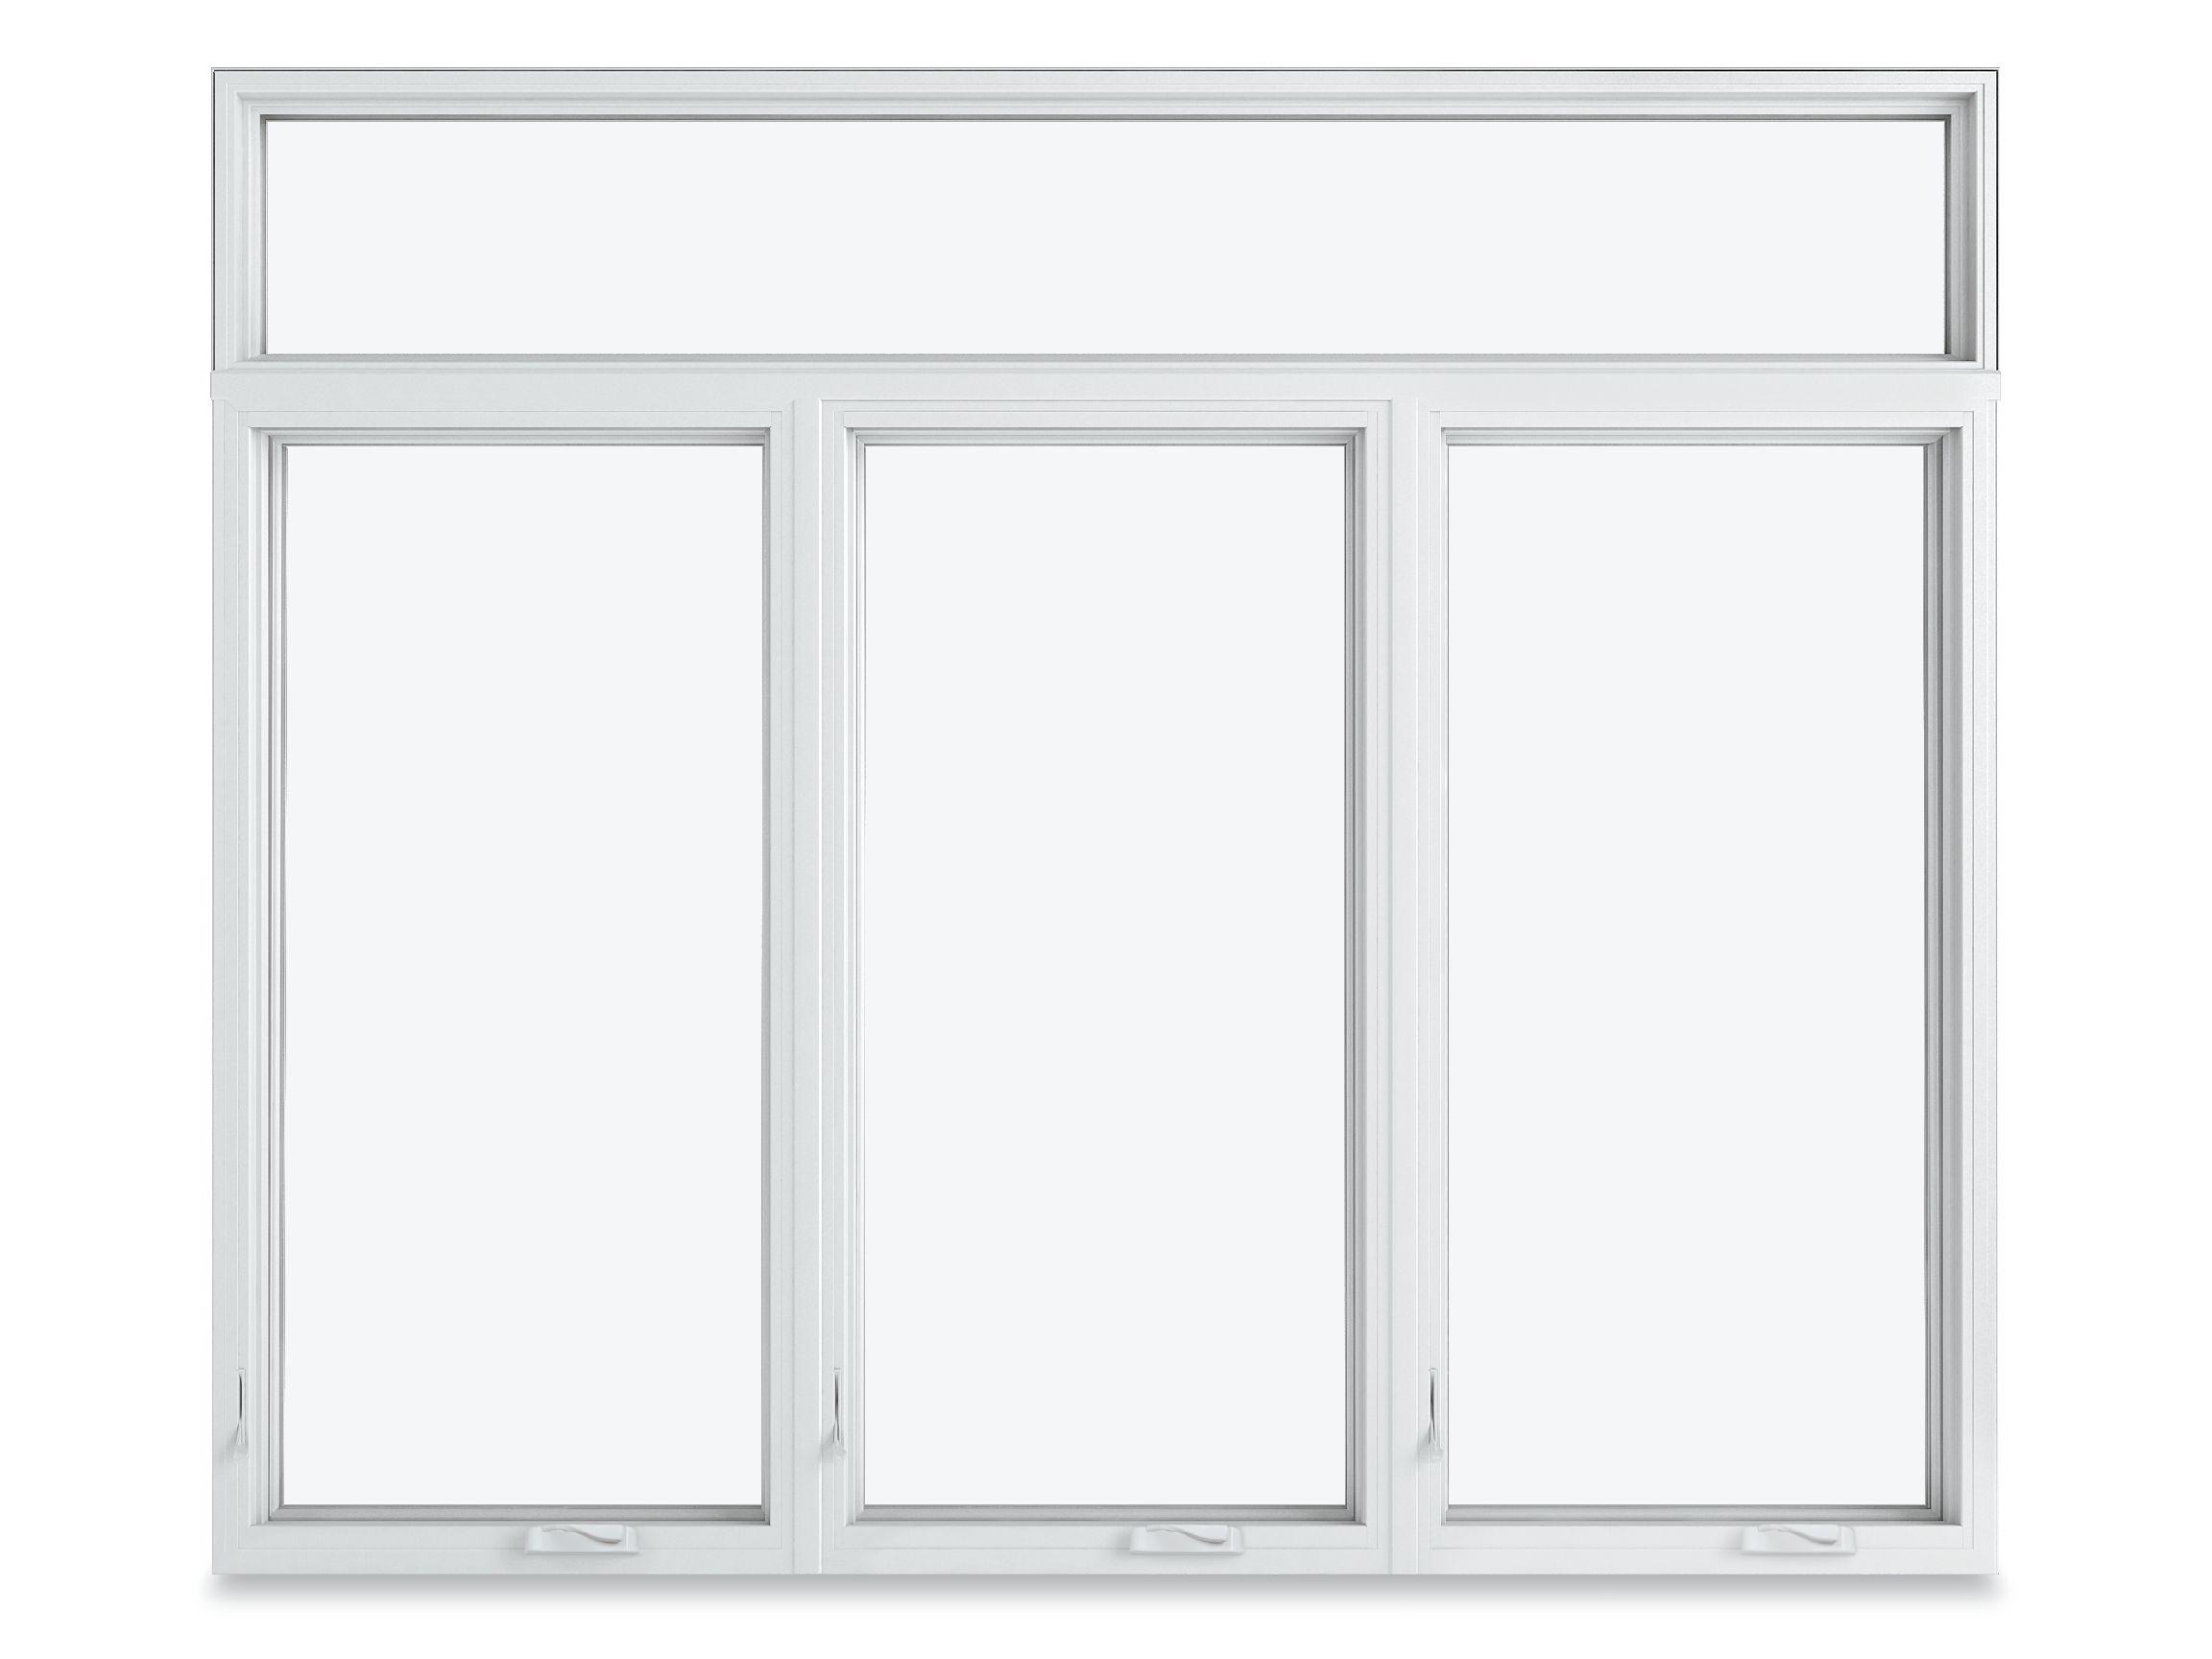 Infinity Casement Casement Windows Casement Replacement Casement Windows